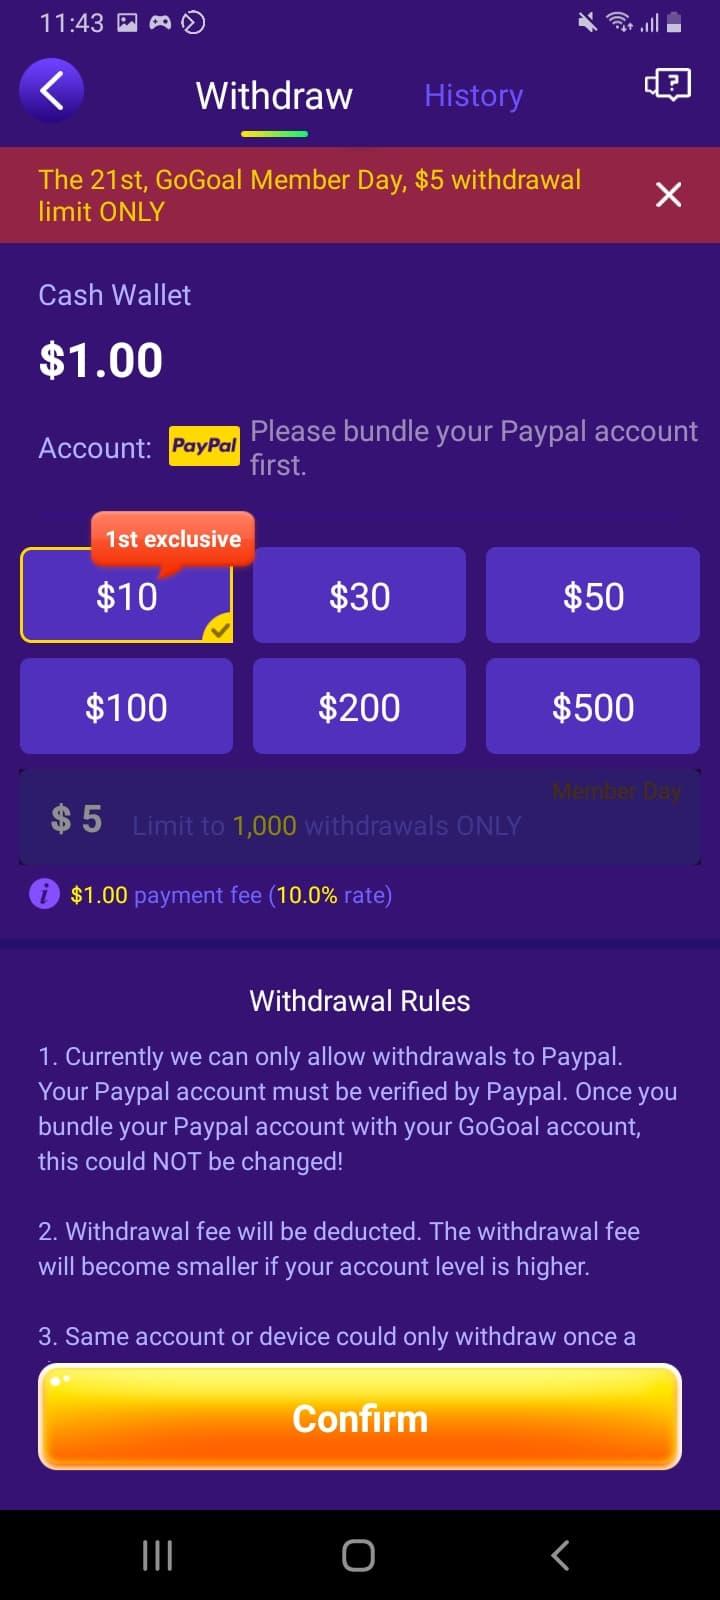 GoGoal App Review - Legit or Scam? $10 in Paypal 2